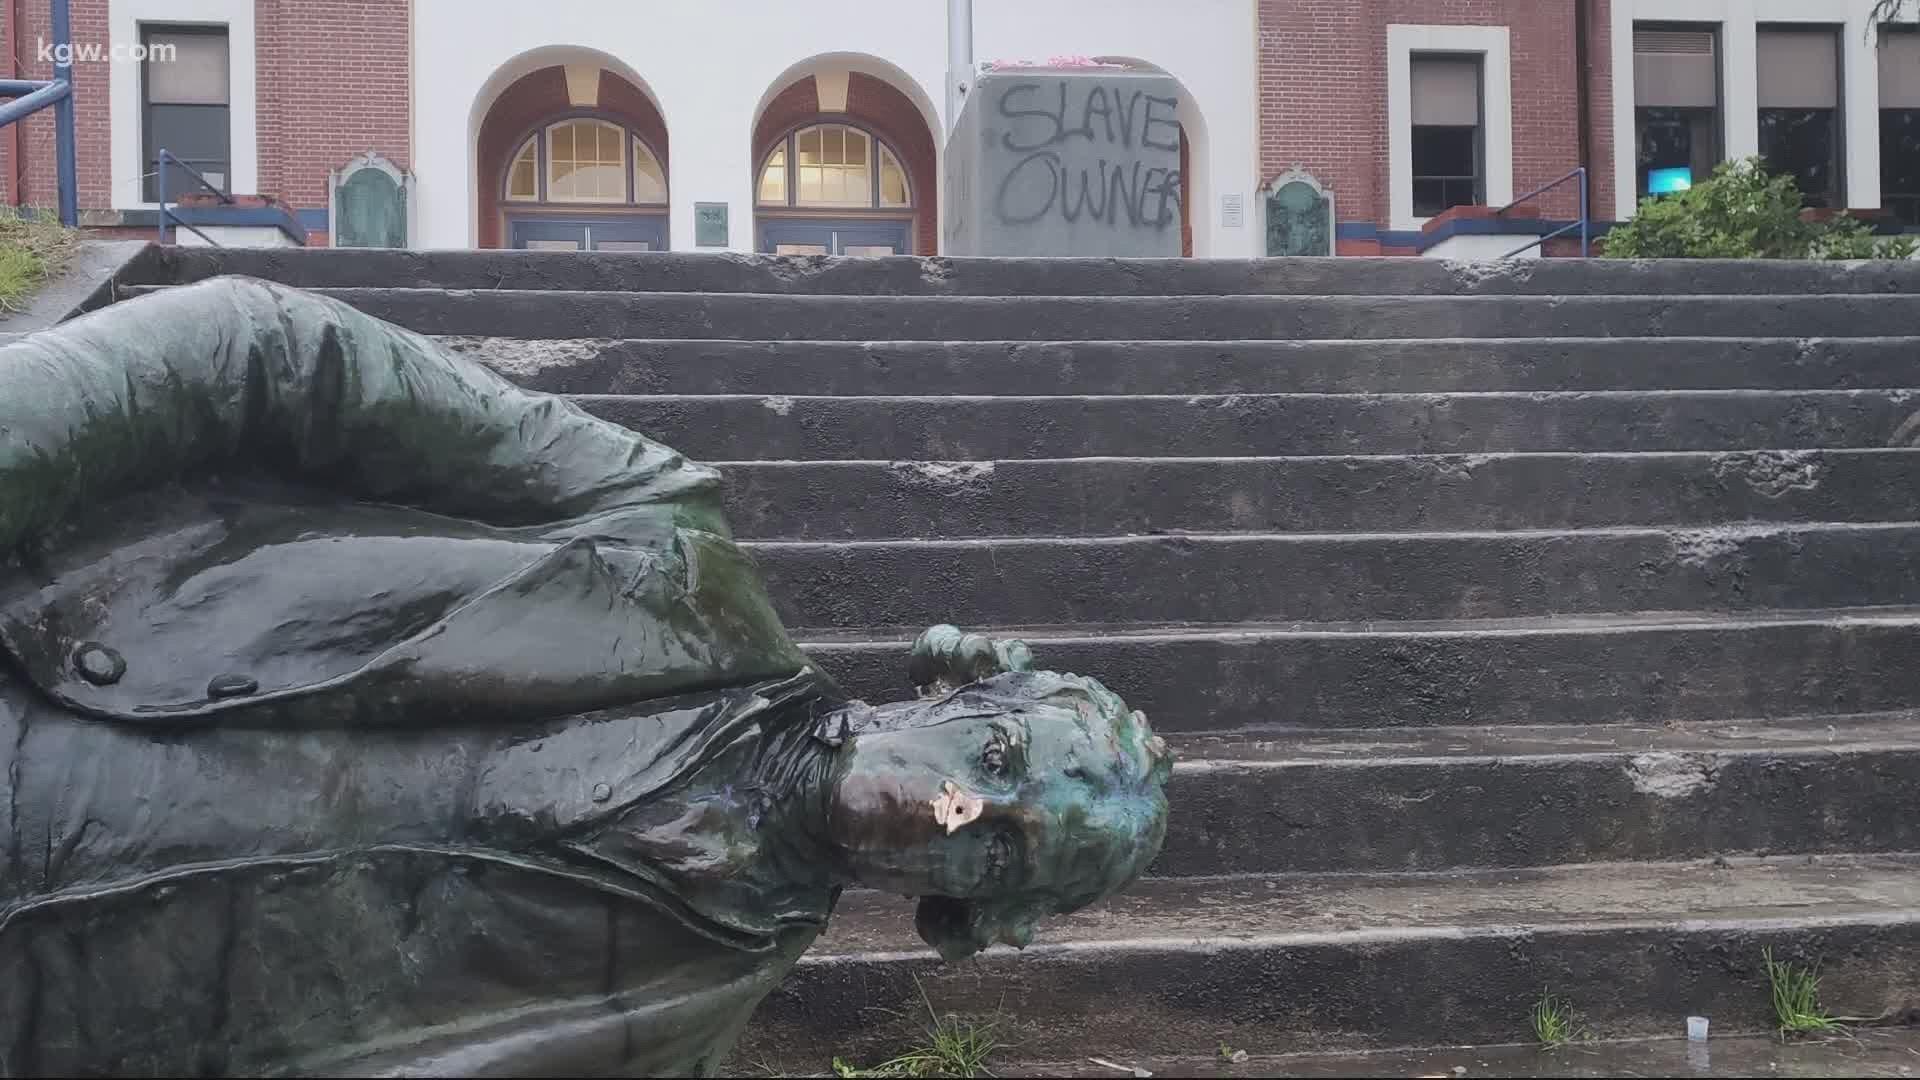 Demonstrators Tear Down Statues Of Racial Suppressors In Oregon Kgw Com